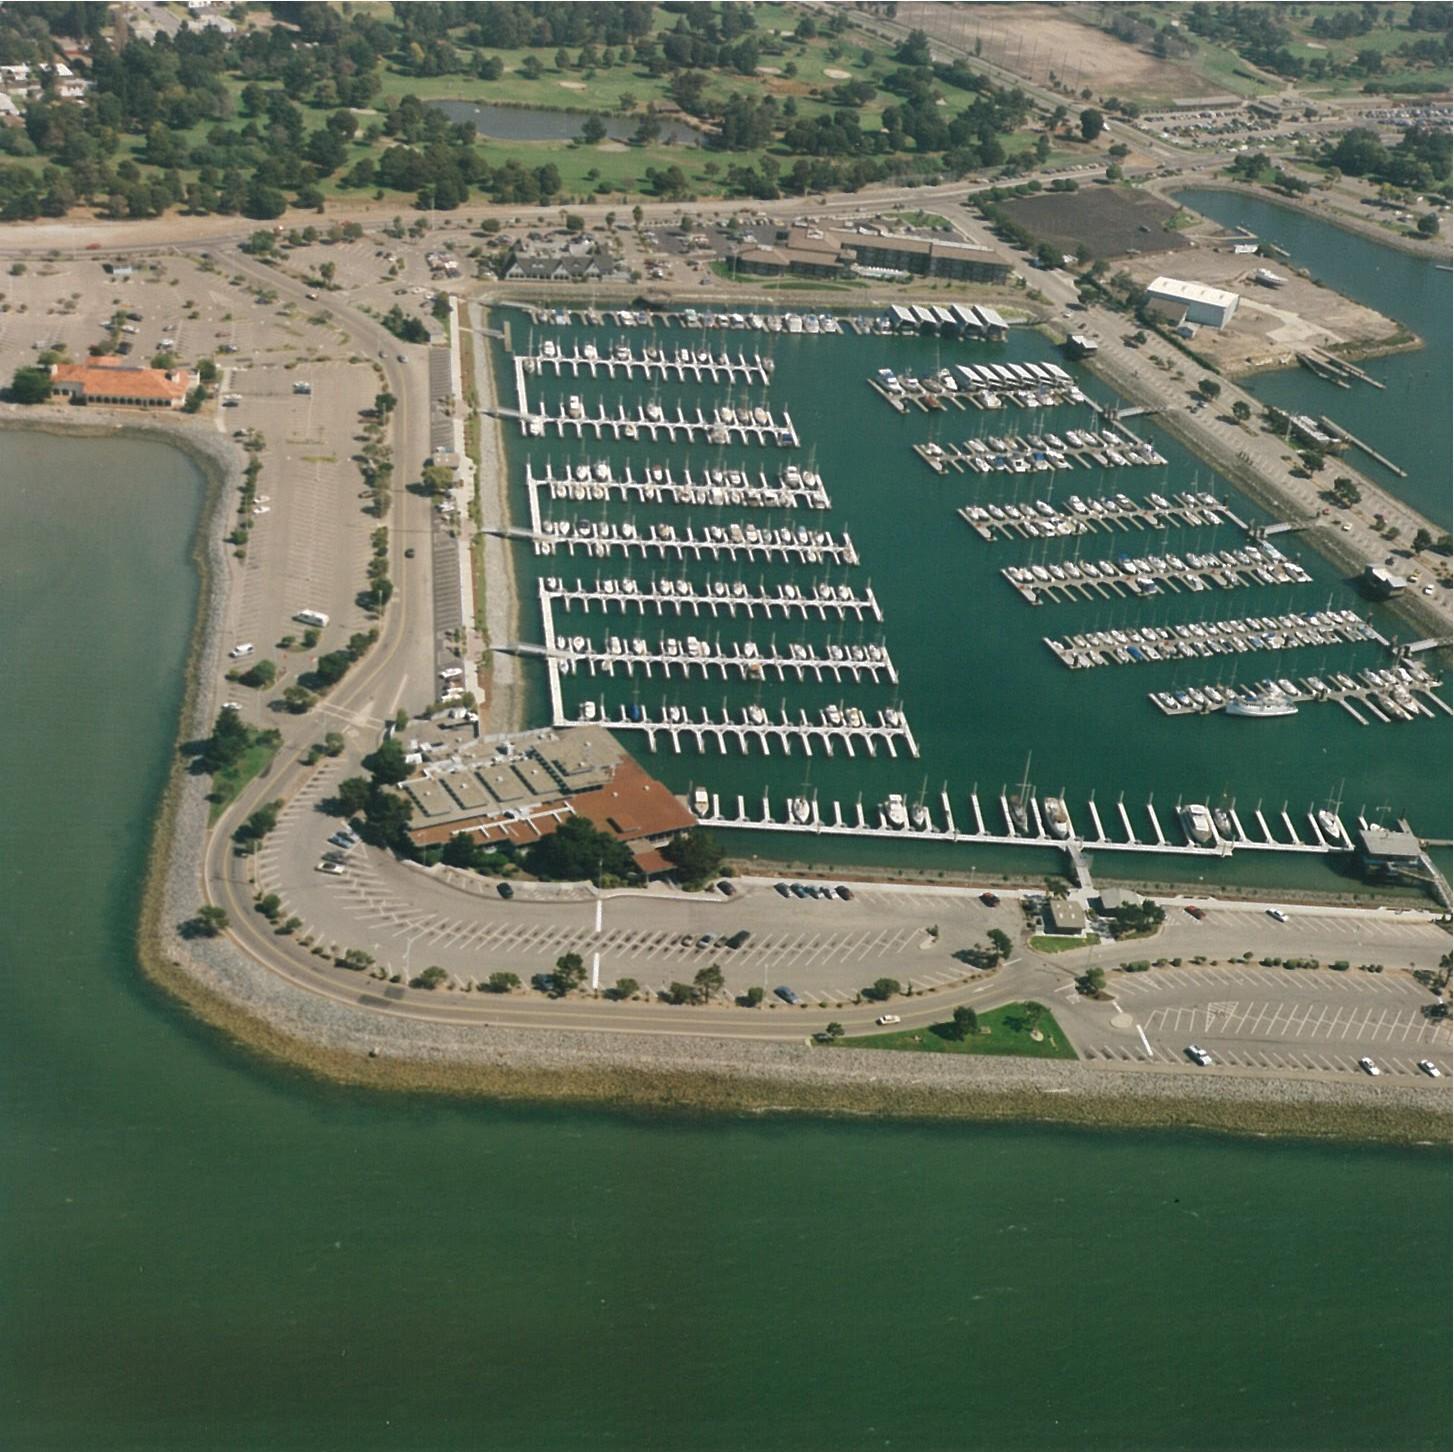 San Leandro Marina Facilities Replacement